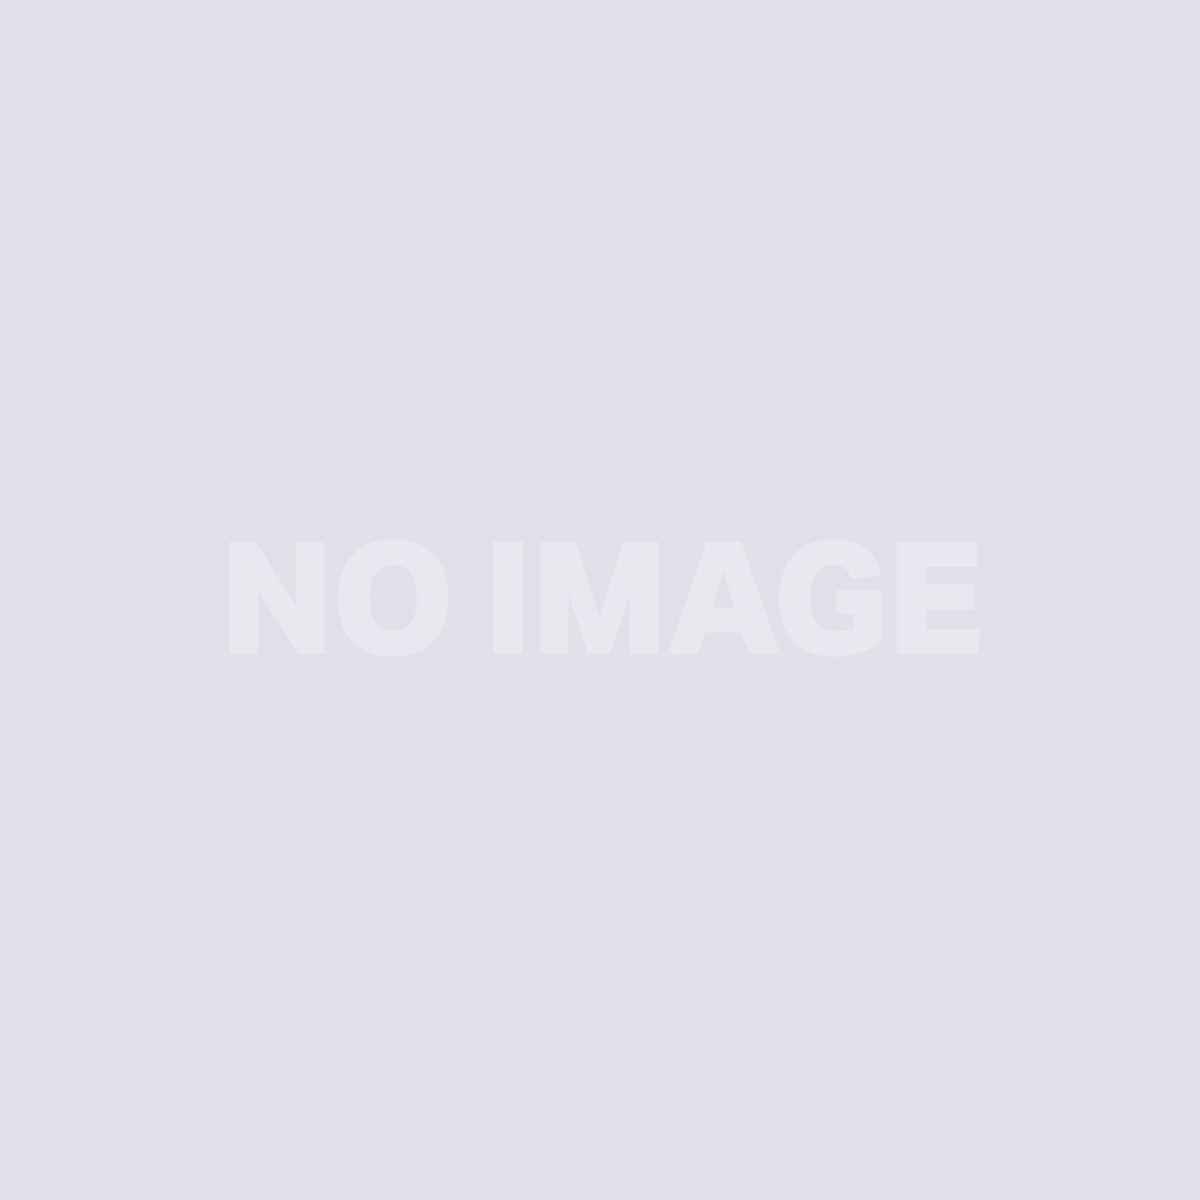 150/42 Nylon Swivel Castor with Ball Bearings